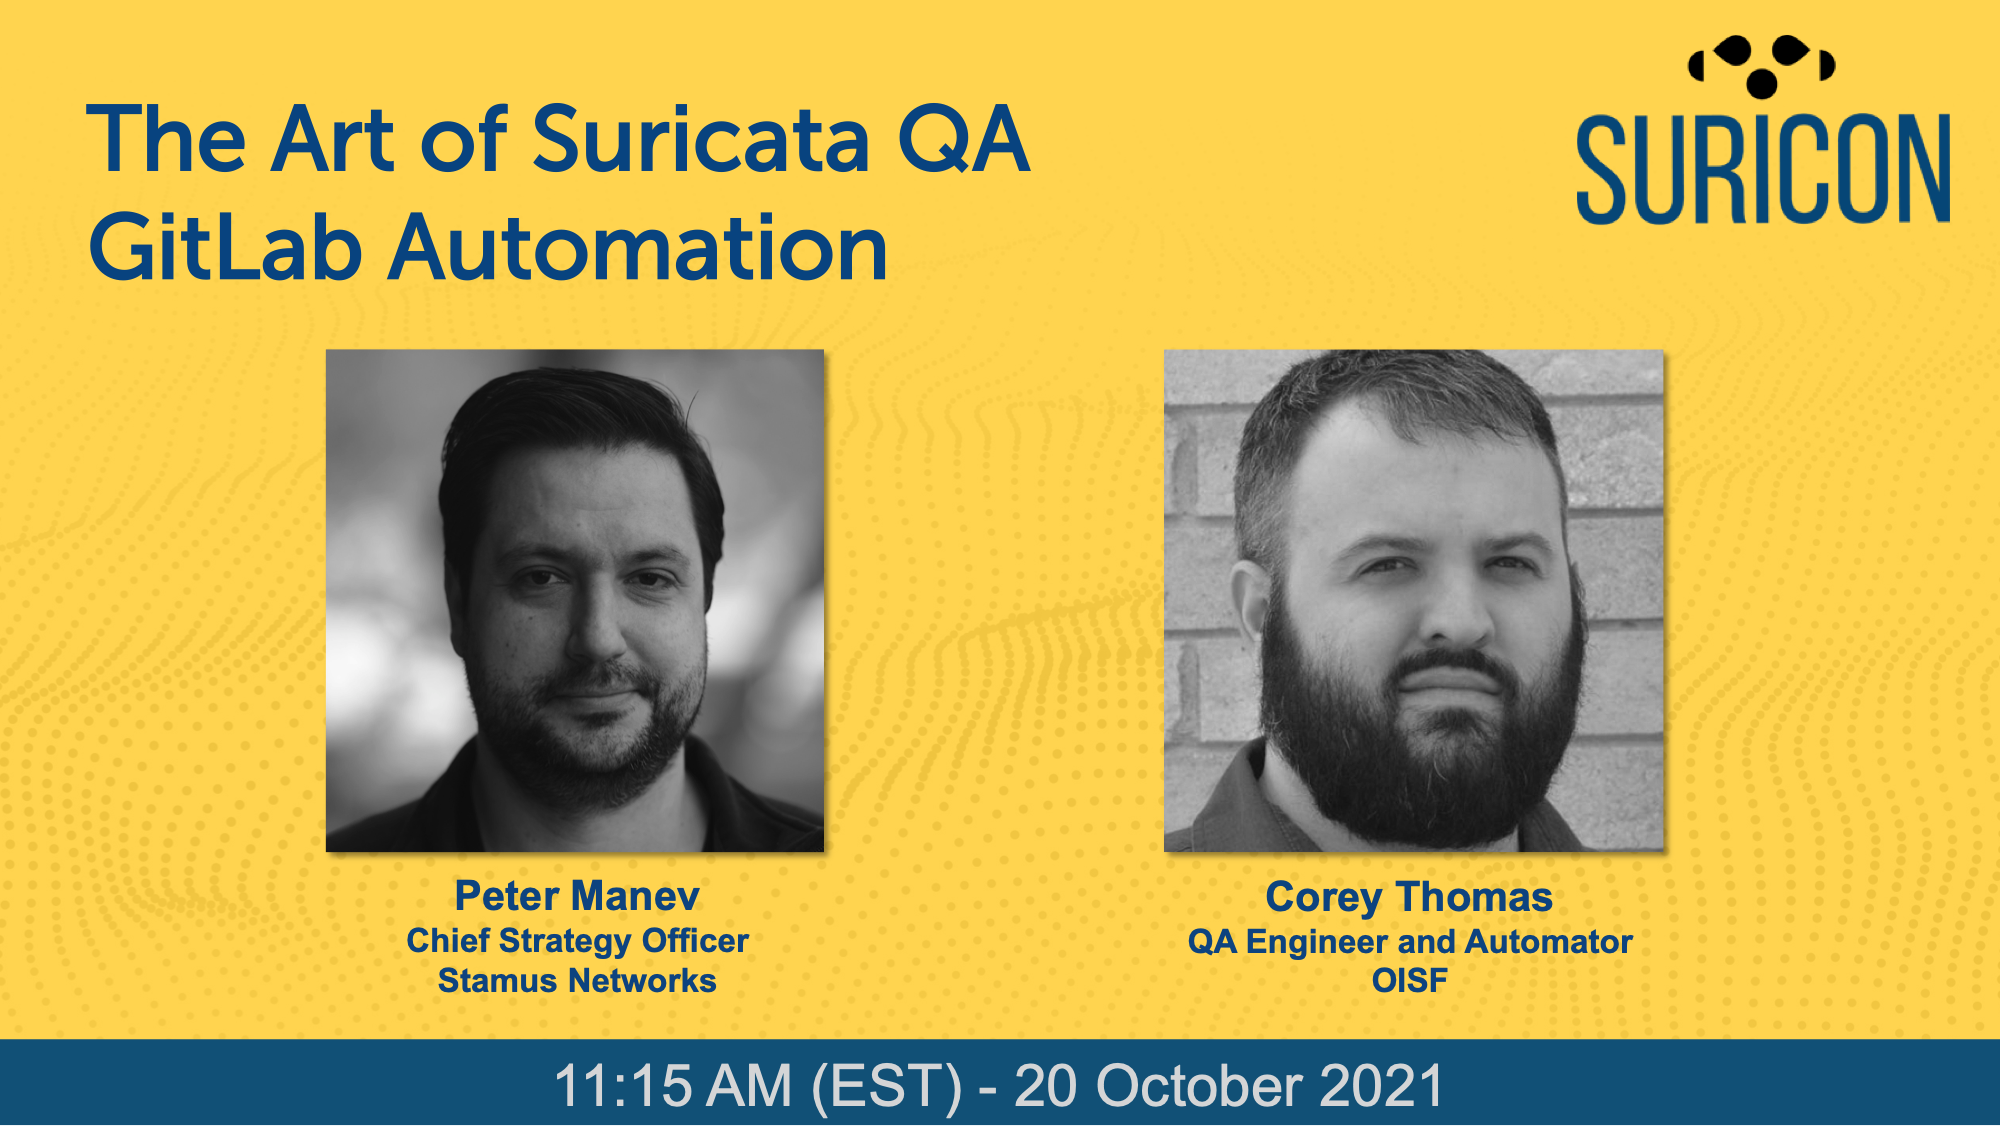 The Art of Suricata QA GitLab Automation